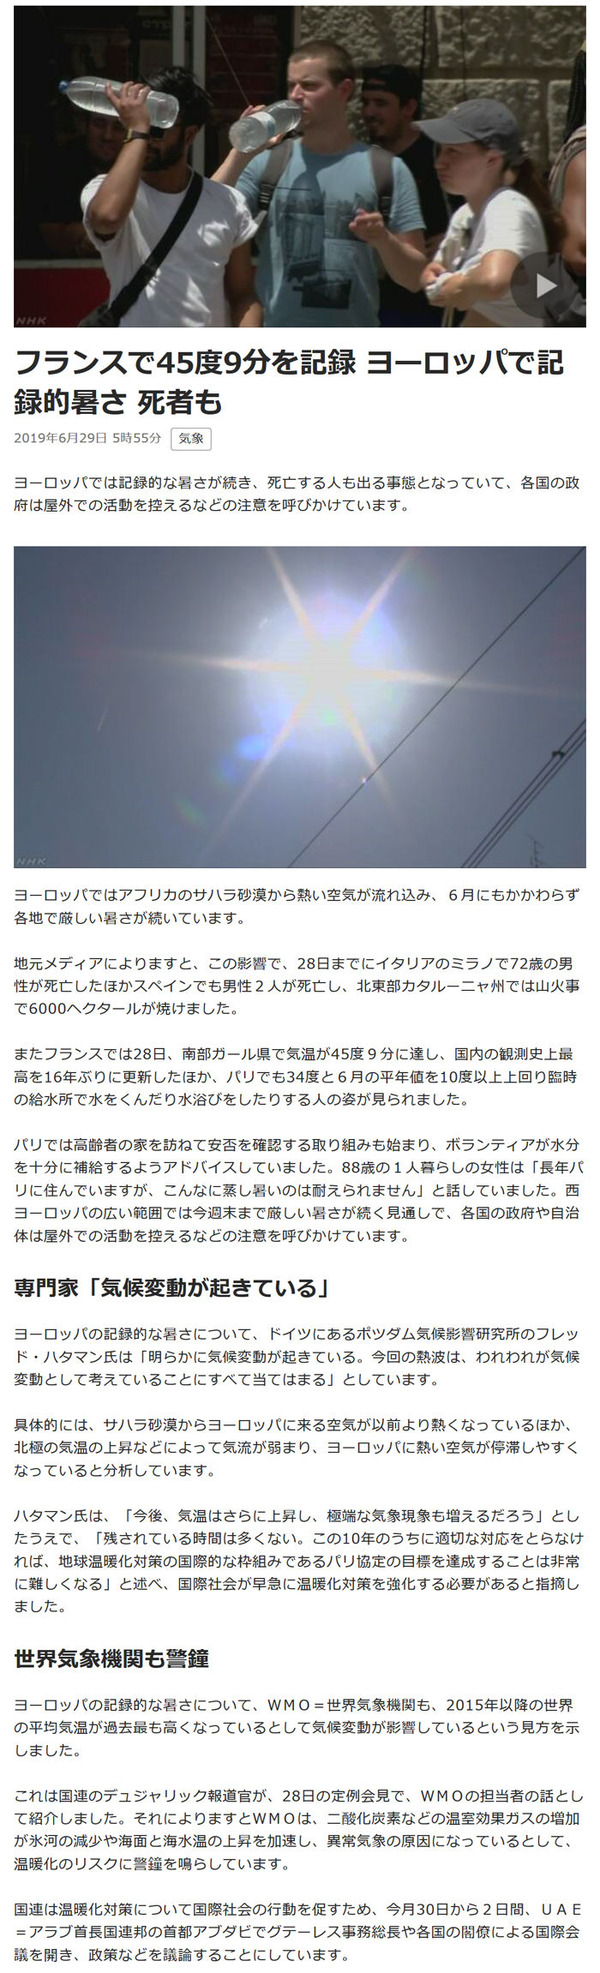 NHK ニュースWEB 700